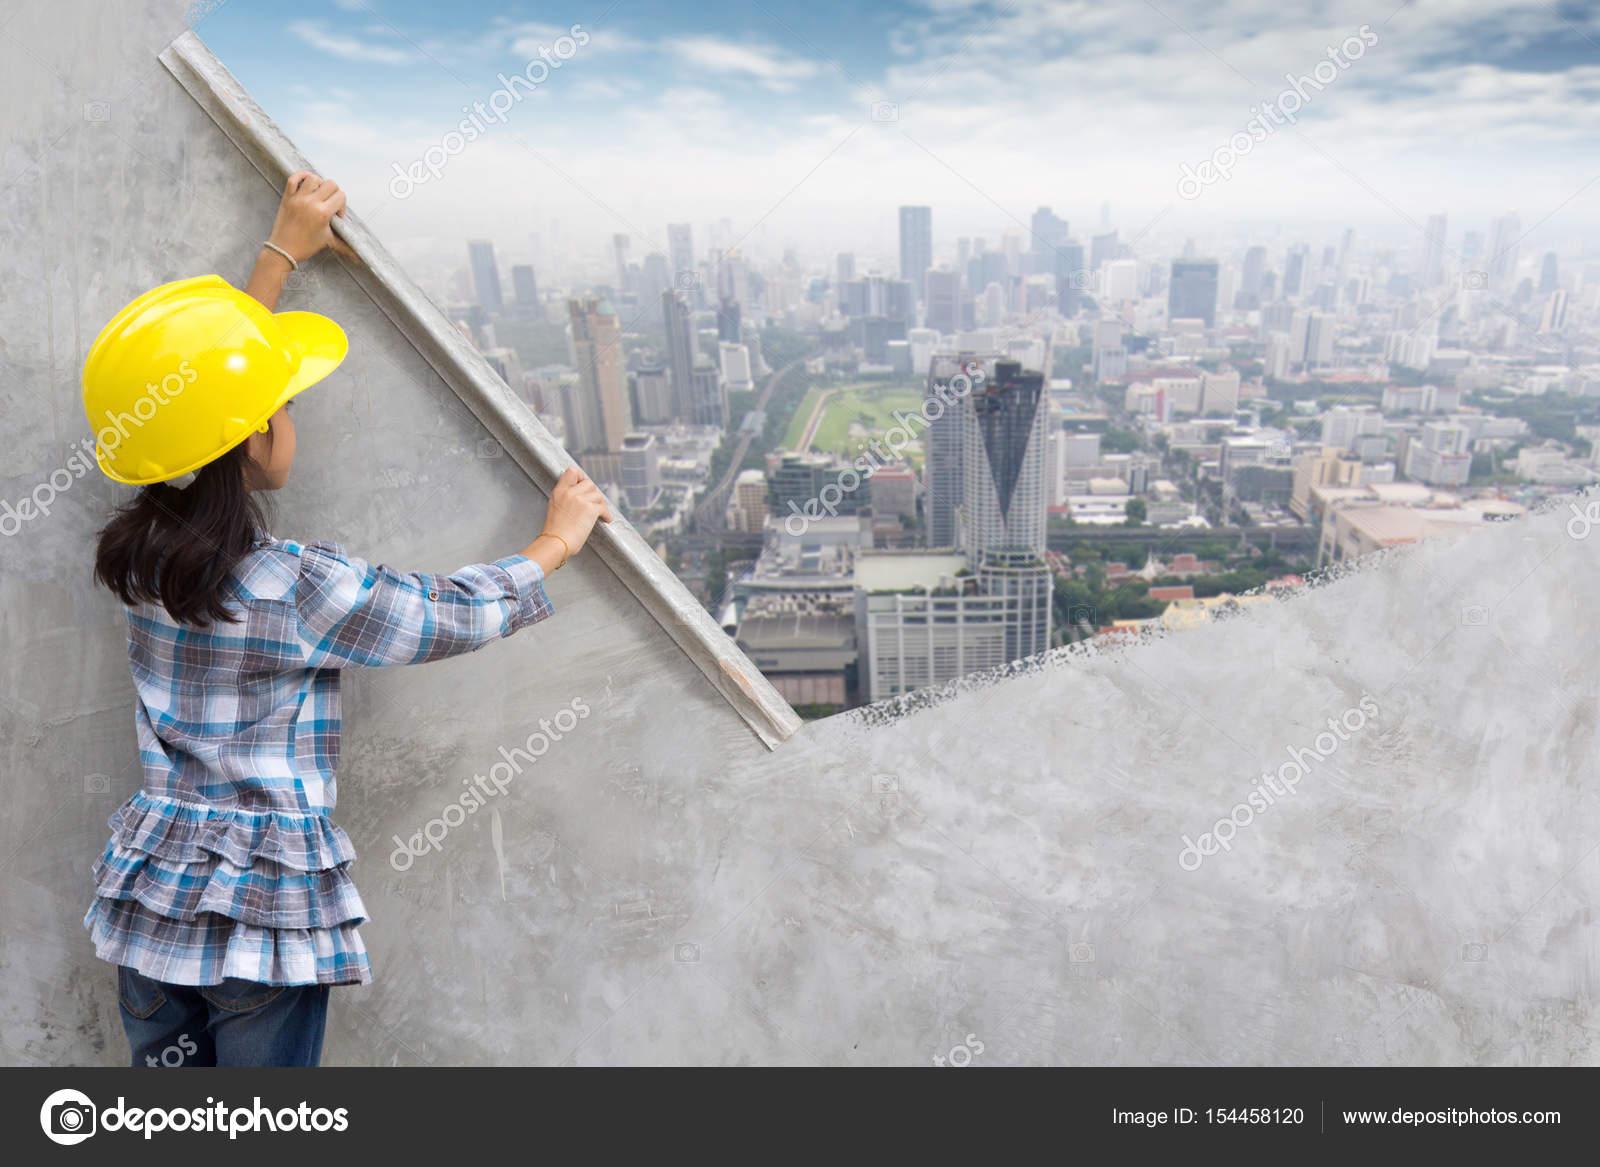 Kleine meisje engineering ideeën concept u stockfoto koydesign